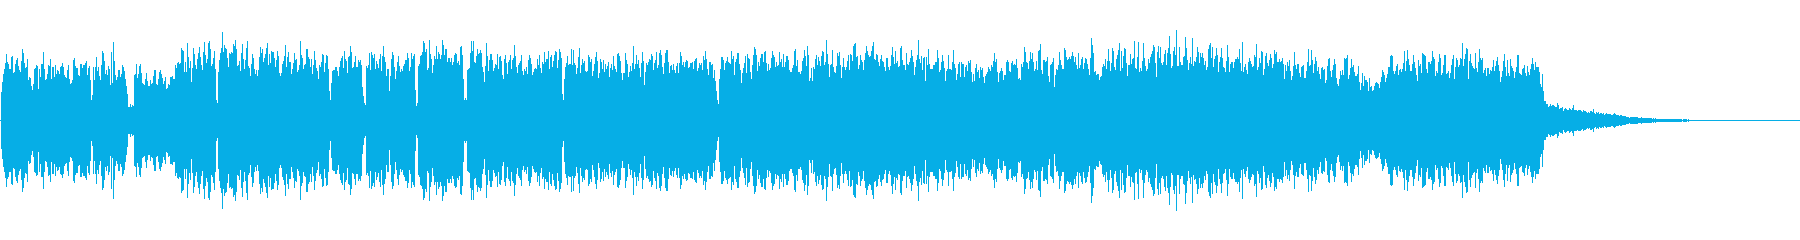 KANTロボット言語効果音6の再生済みの波形